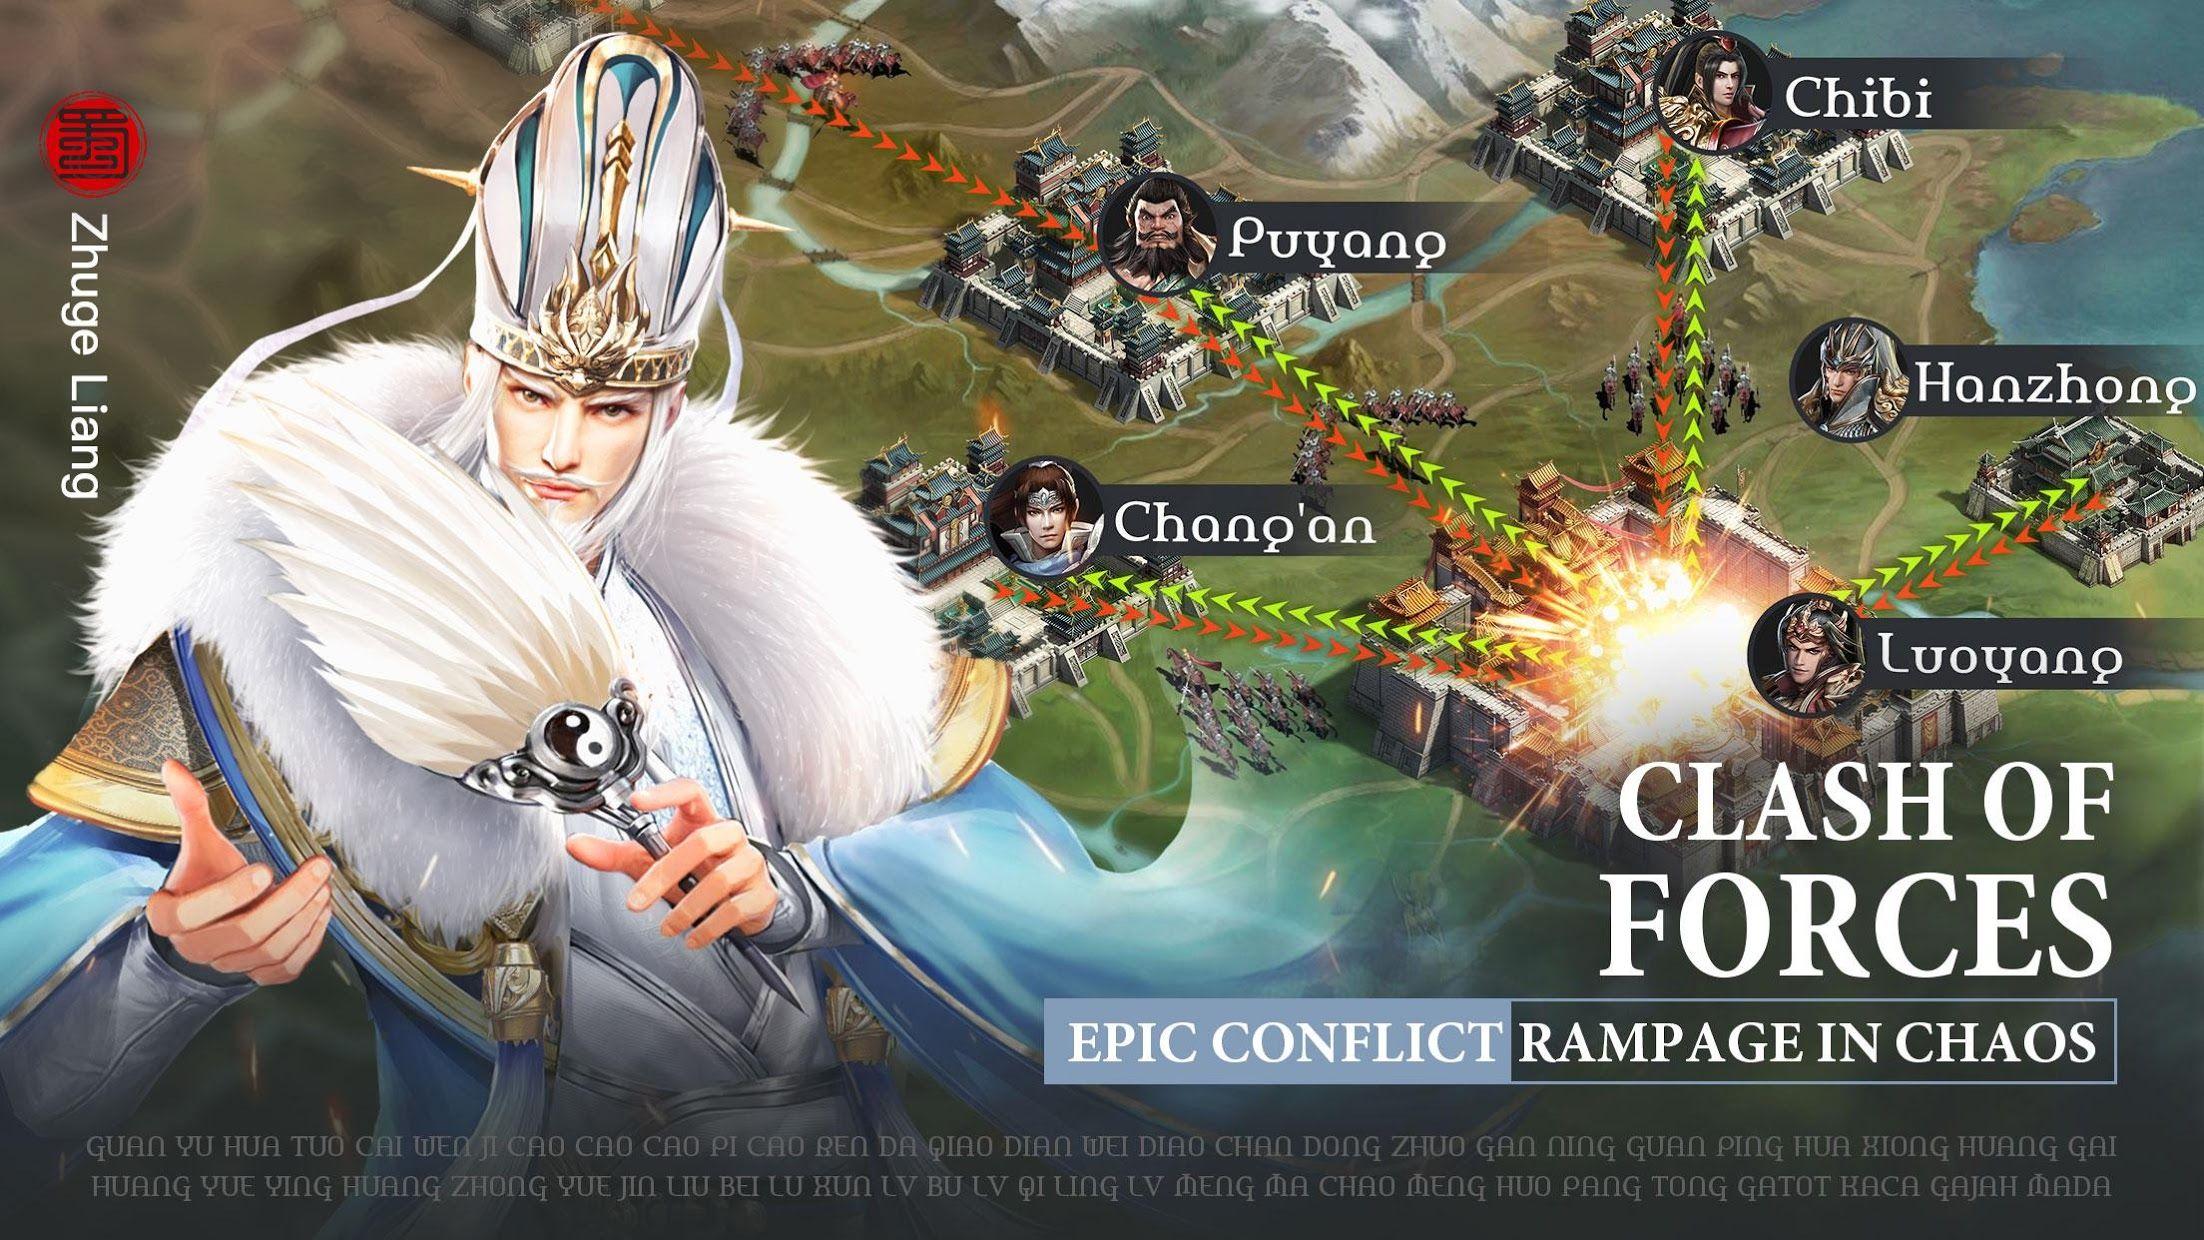 Three Kingdoms: Raja Chaos 游戏截图5